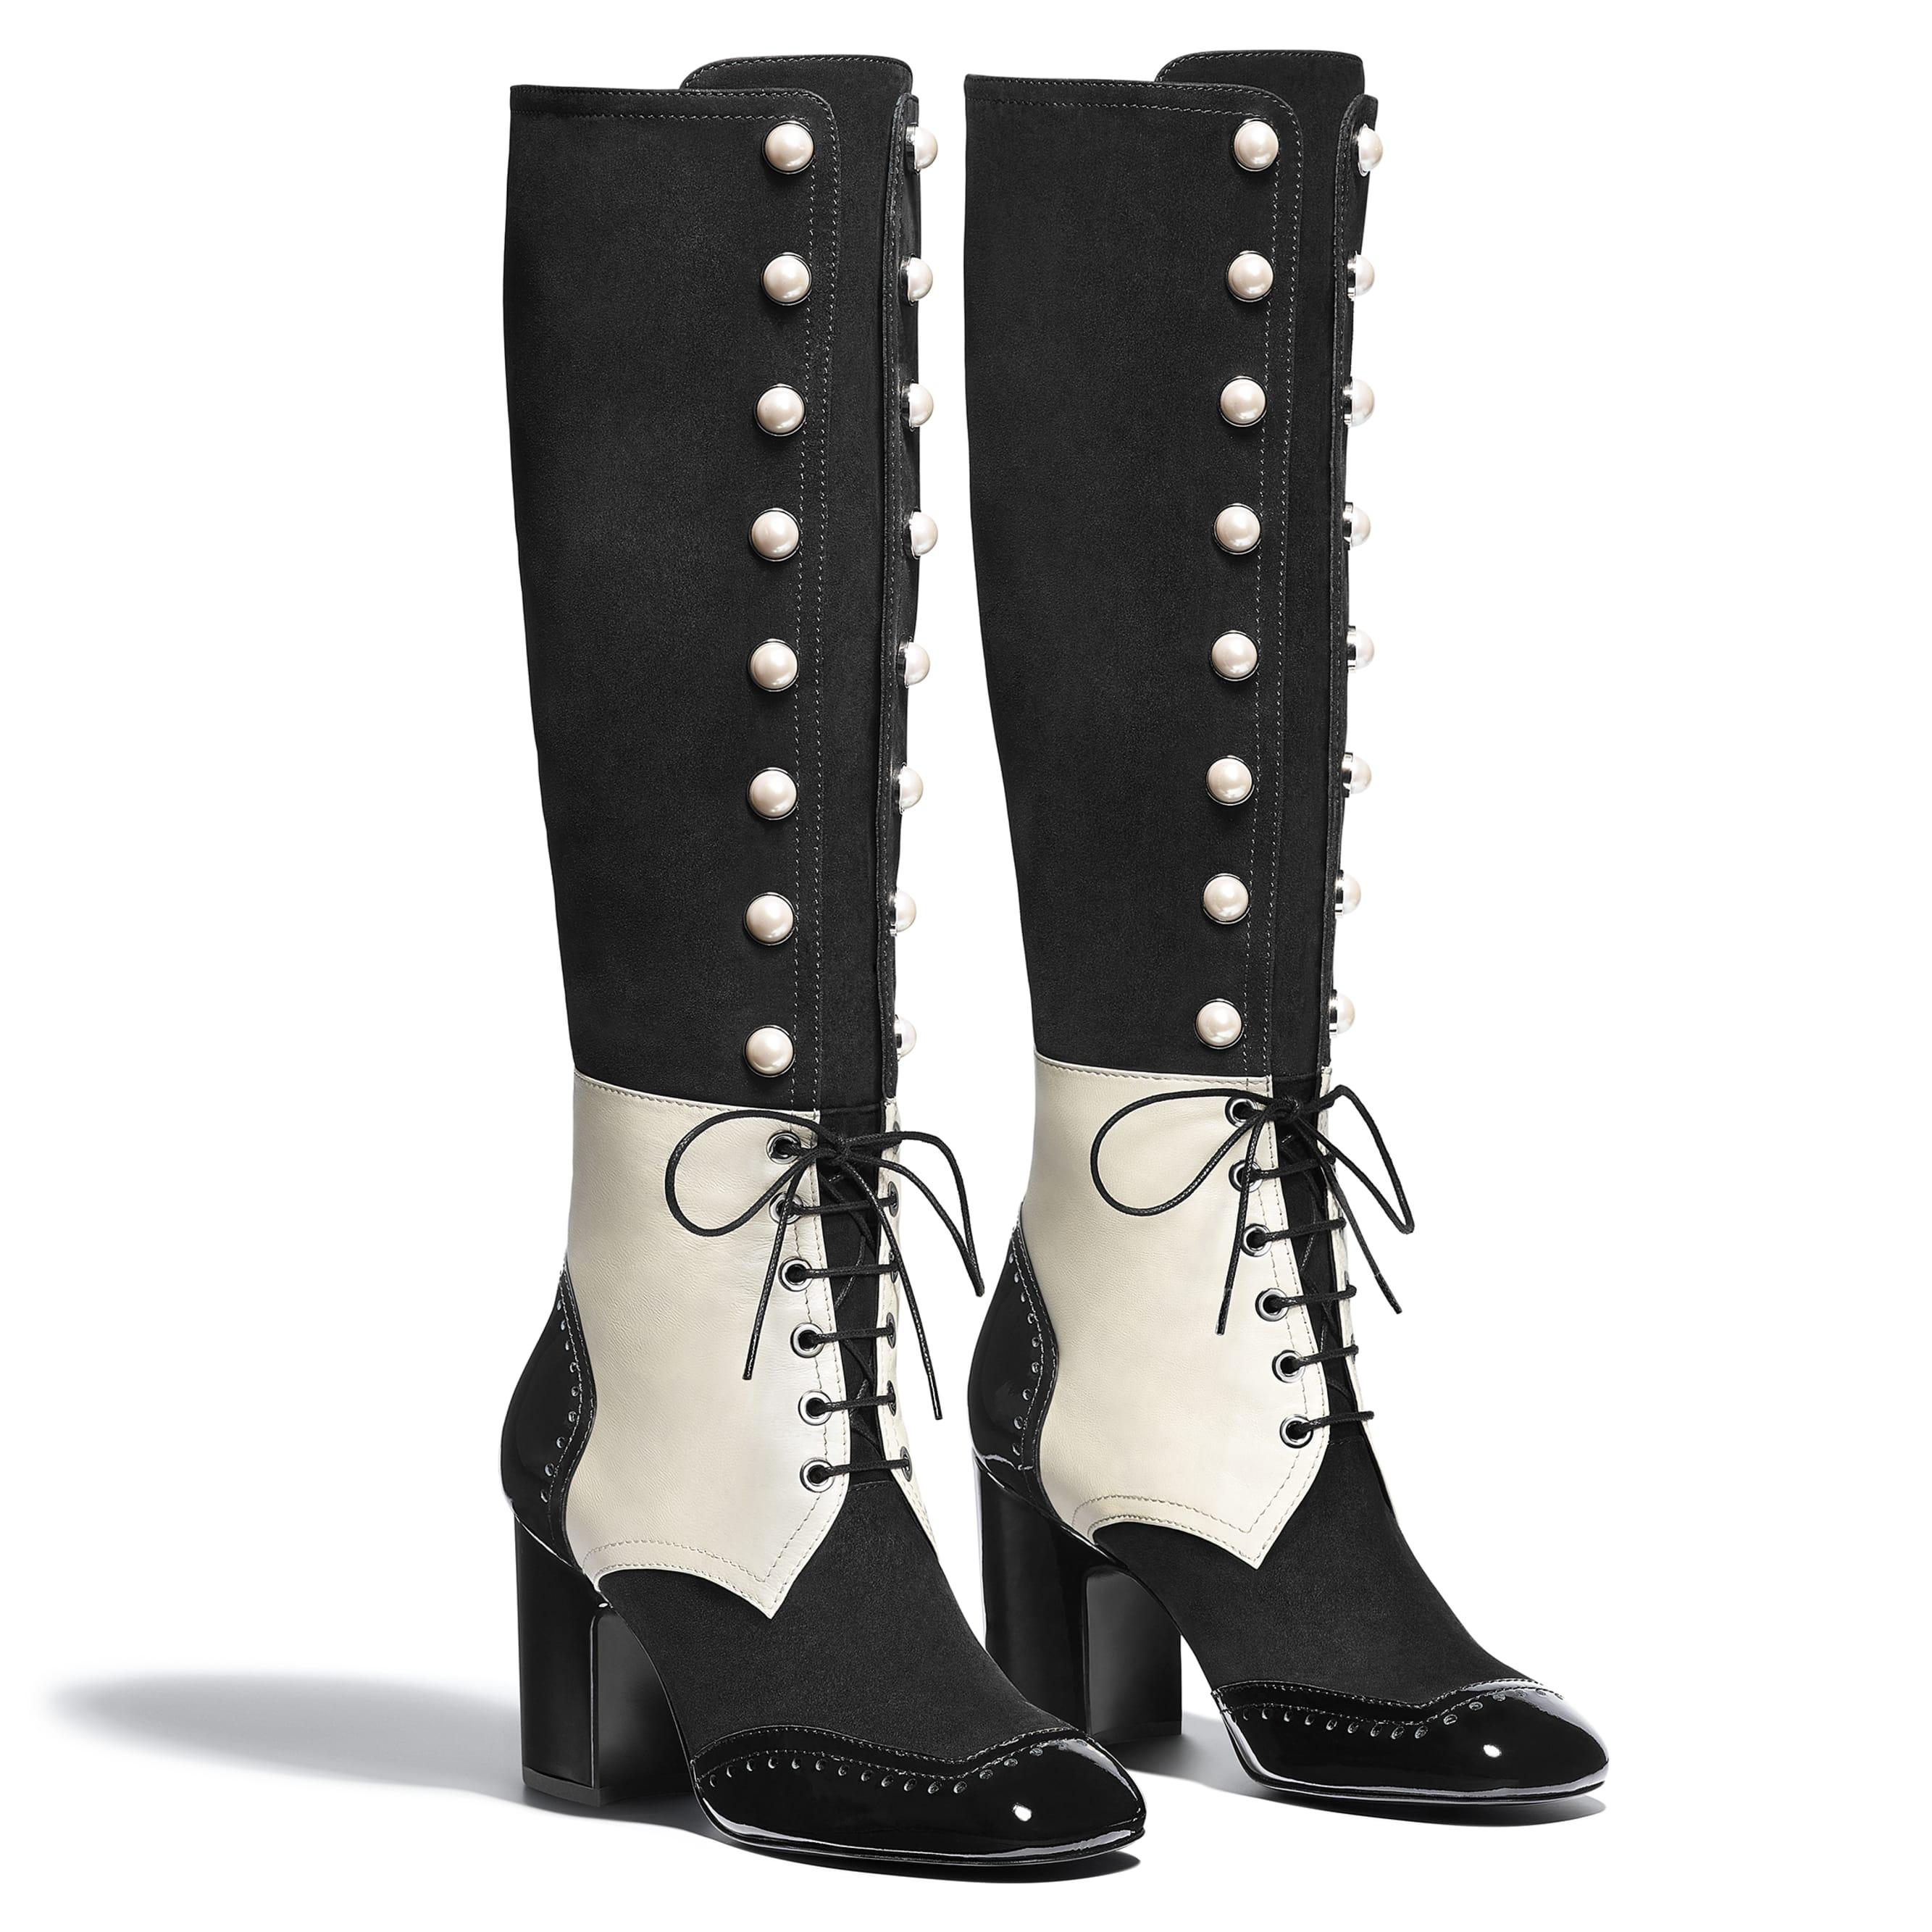 High Boots - Black & Ecru - Suede Goatskin, Lambskin & Patent Calfskin - Alternative view - see standard sized version